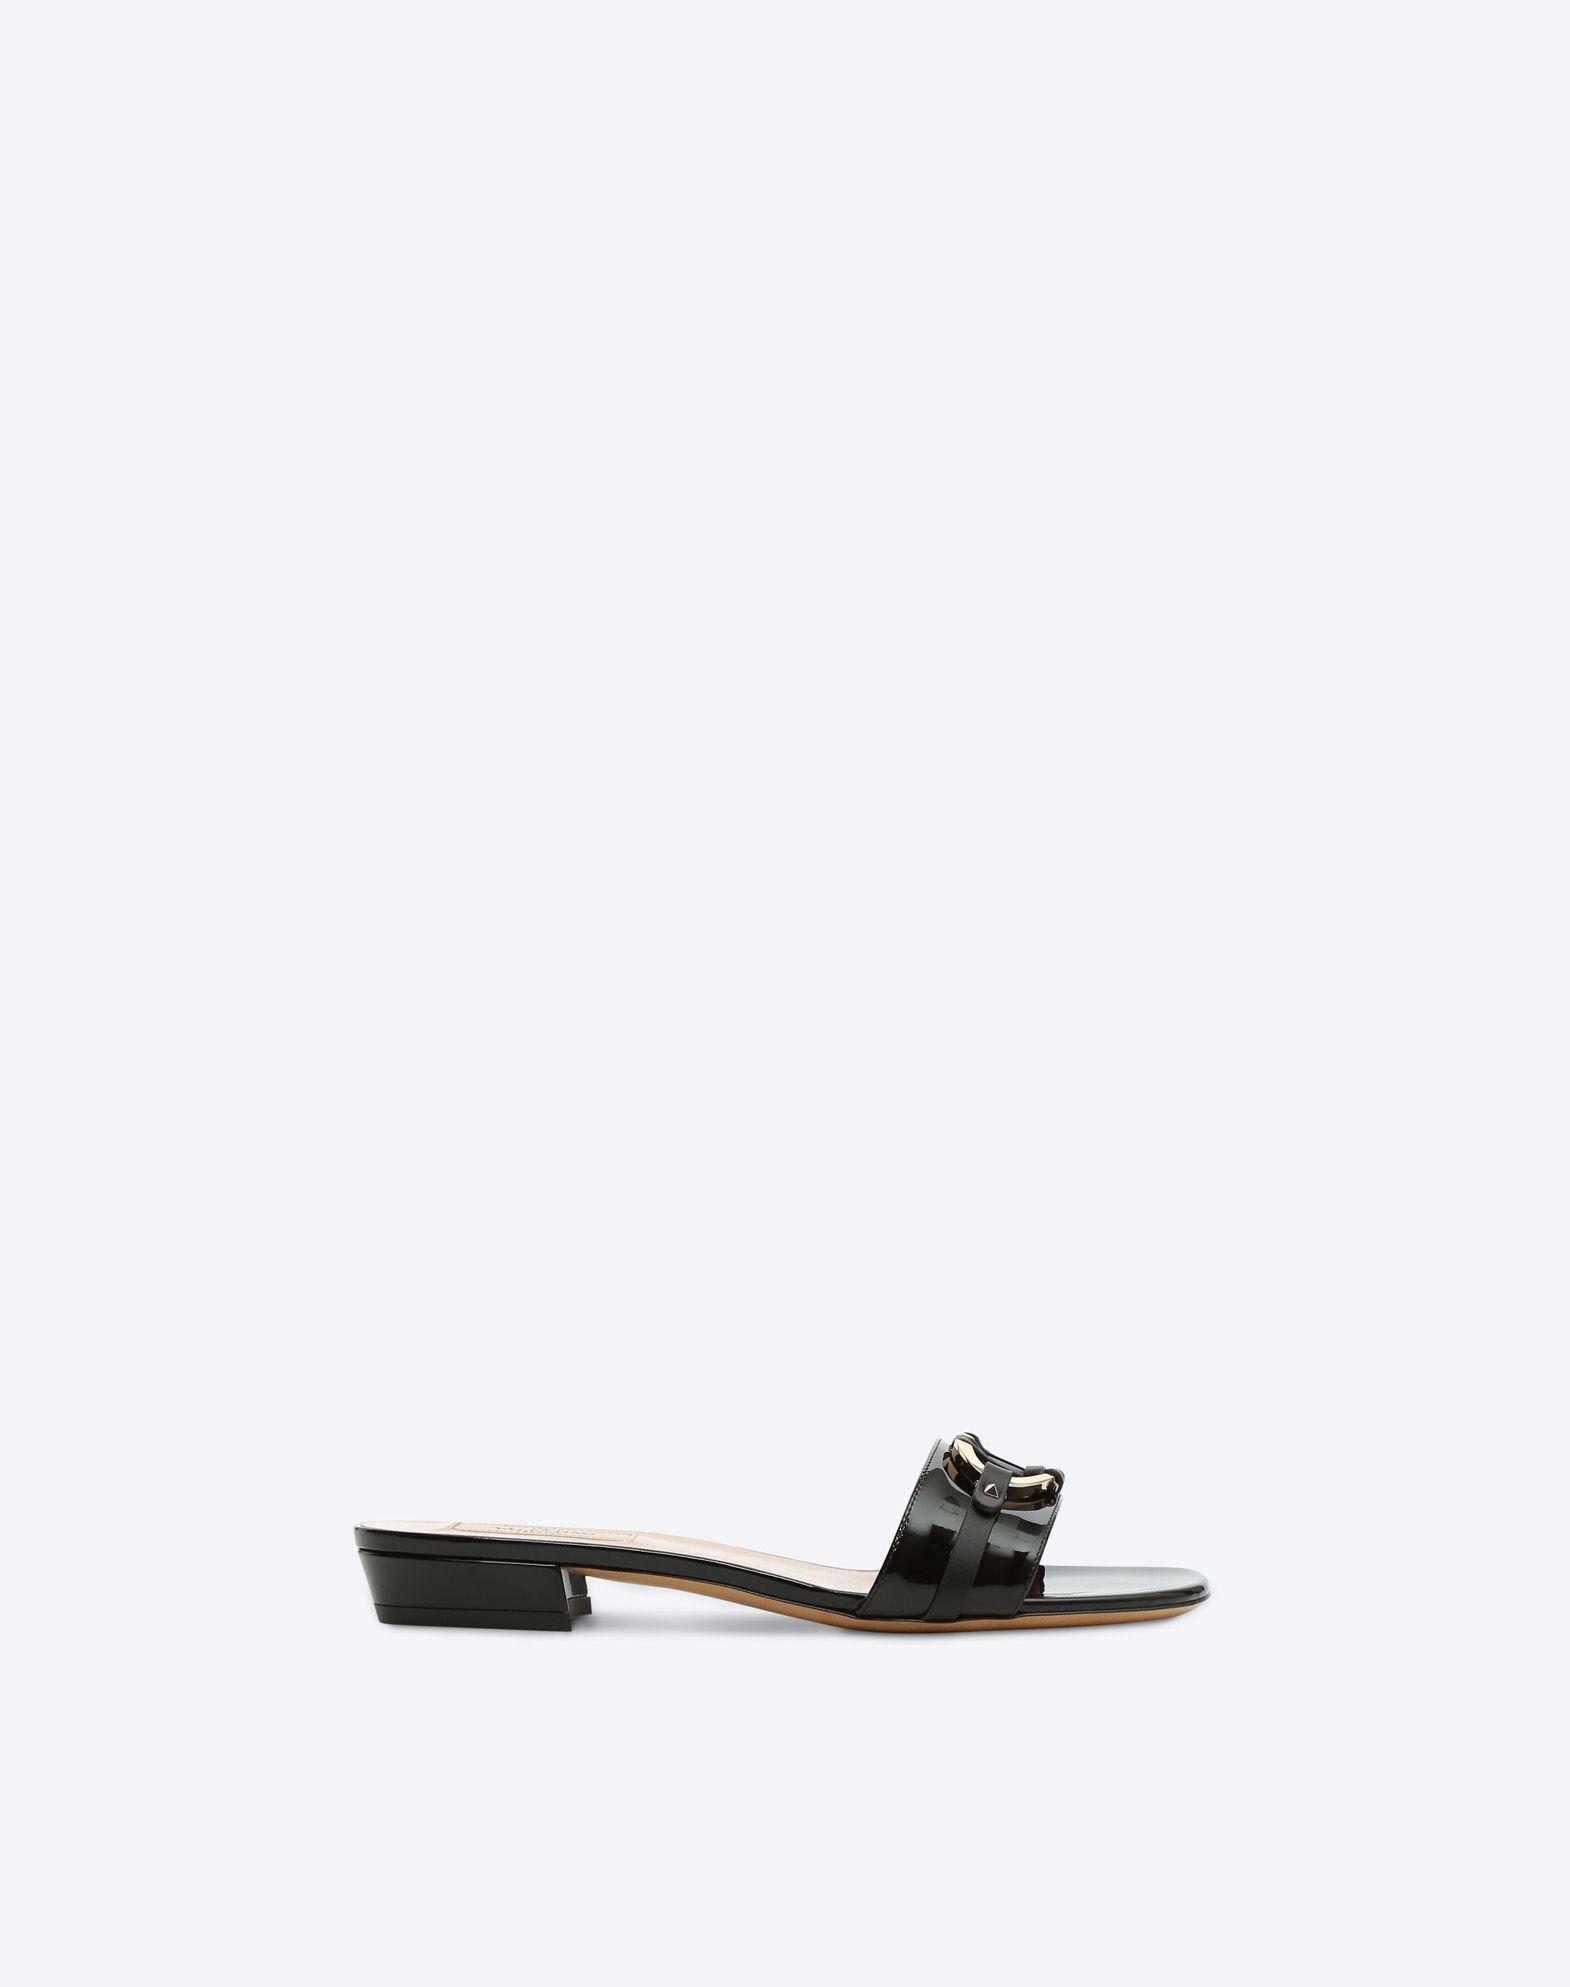 VALENTINO 漆面效果 金属细节装饰 单色 方型鞋跟  45387767pp